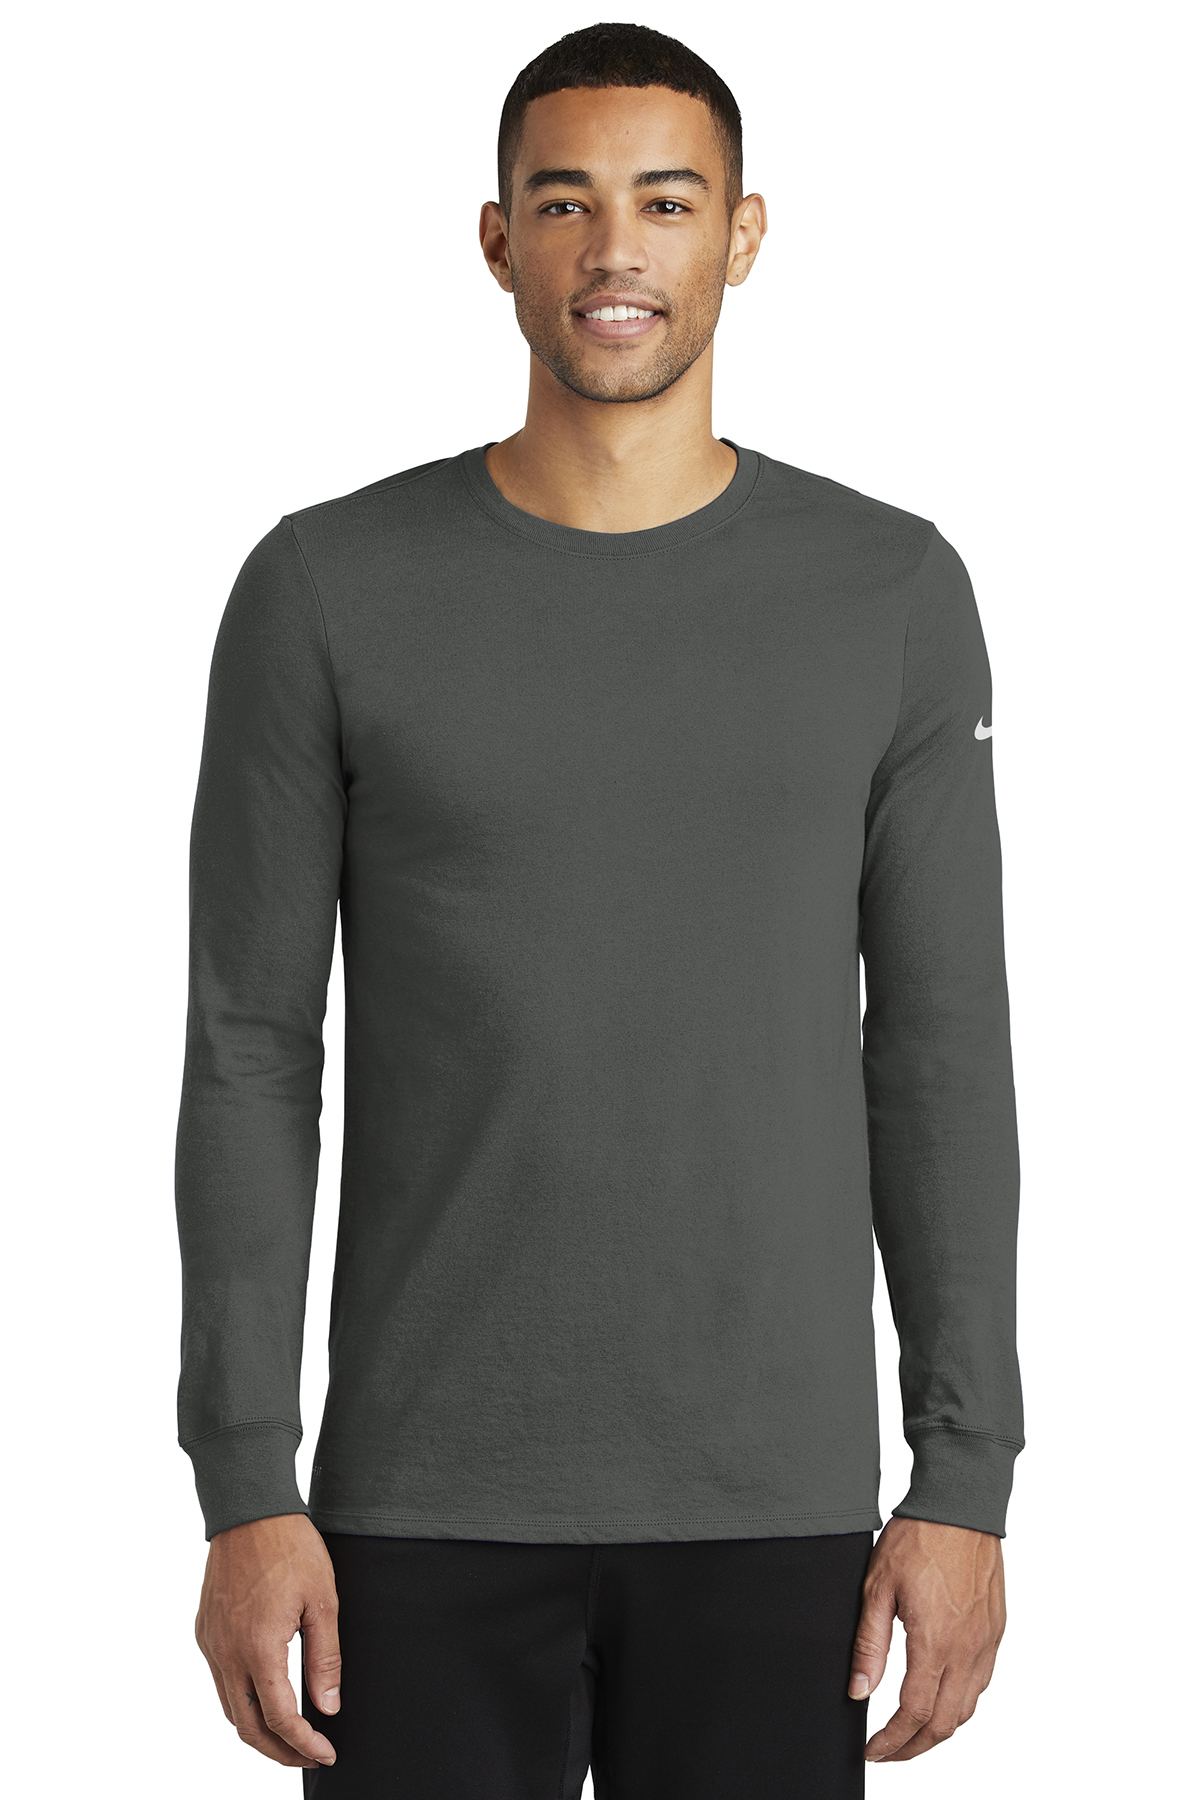 Nike Golf NKBQ5230 - Dri-FIT Cotton/Poly Long Sleeve Tee